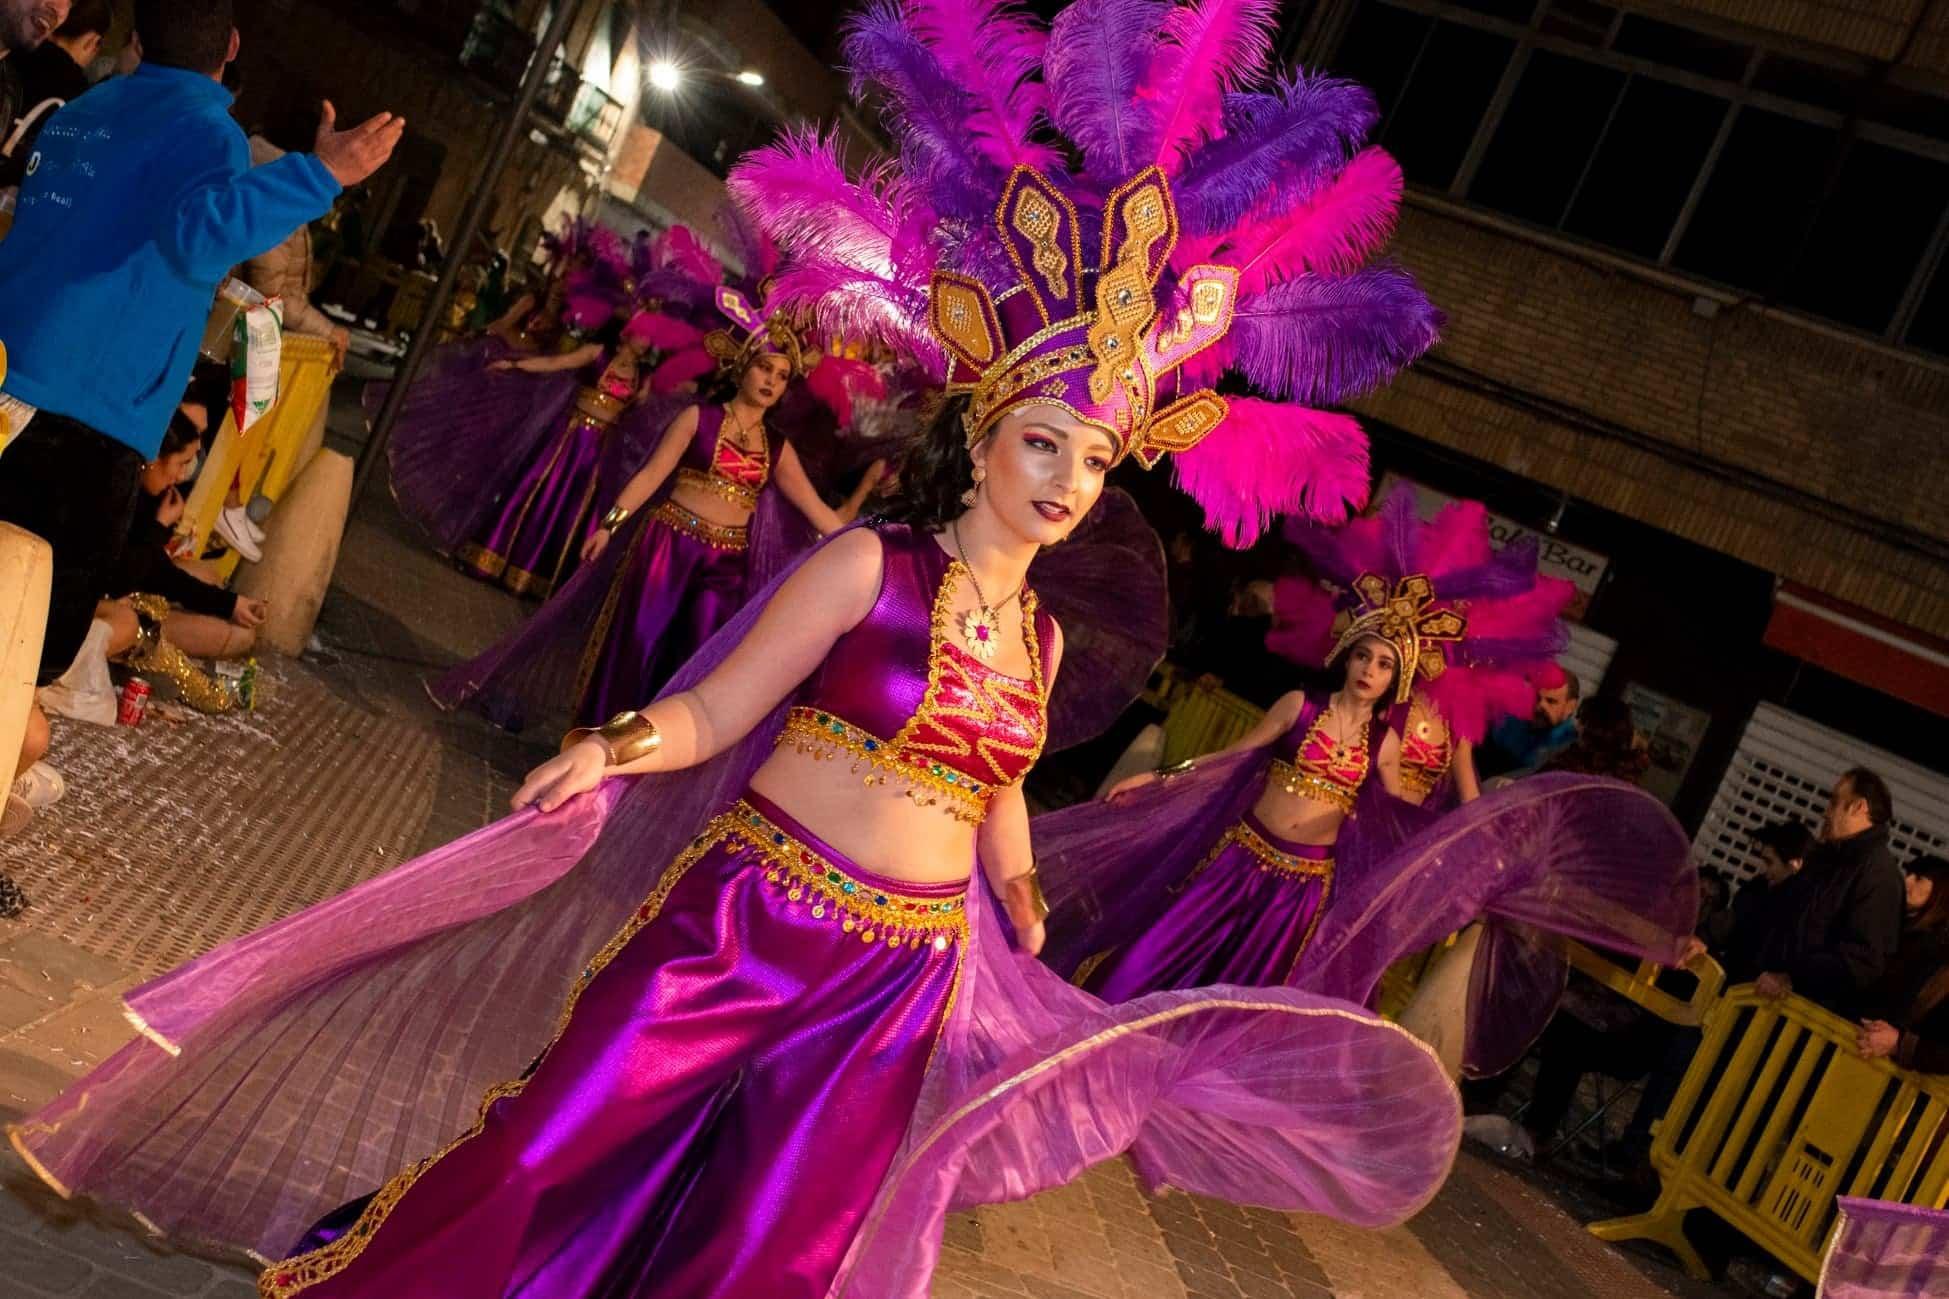 Carnaval de herencia 2020 ofertorio 98 - Selección de fotografías del Ofertorio del Carnaval de Herencia